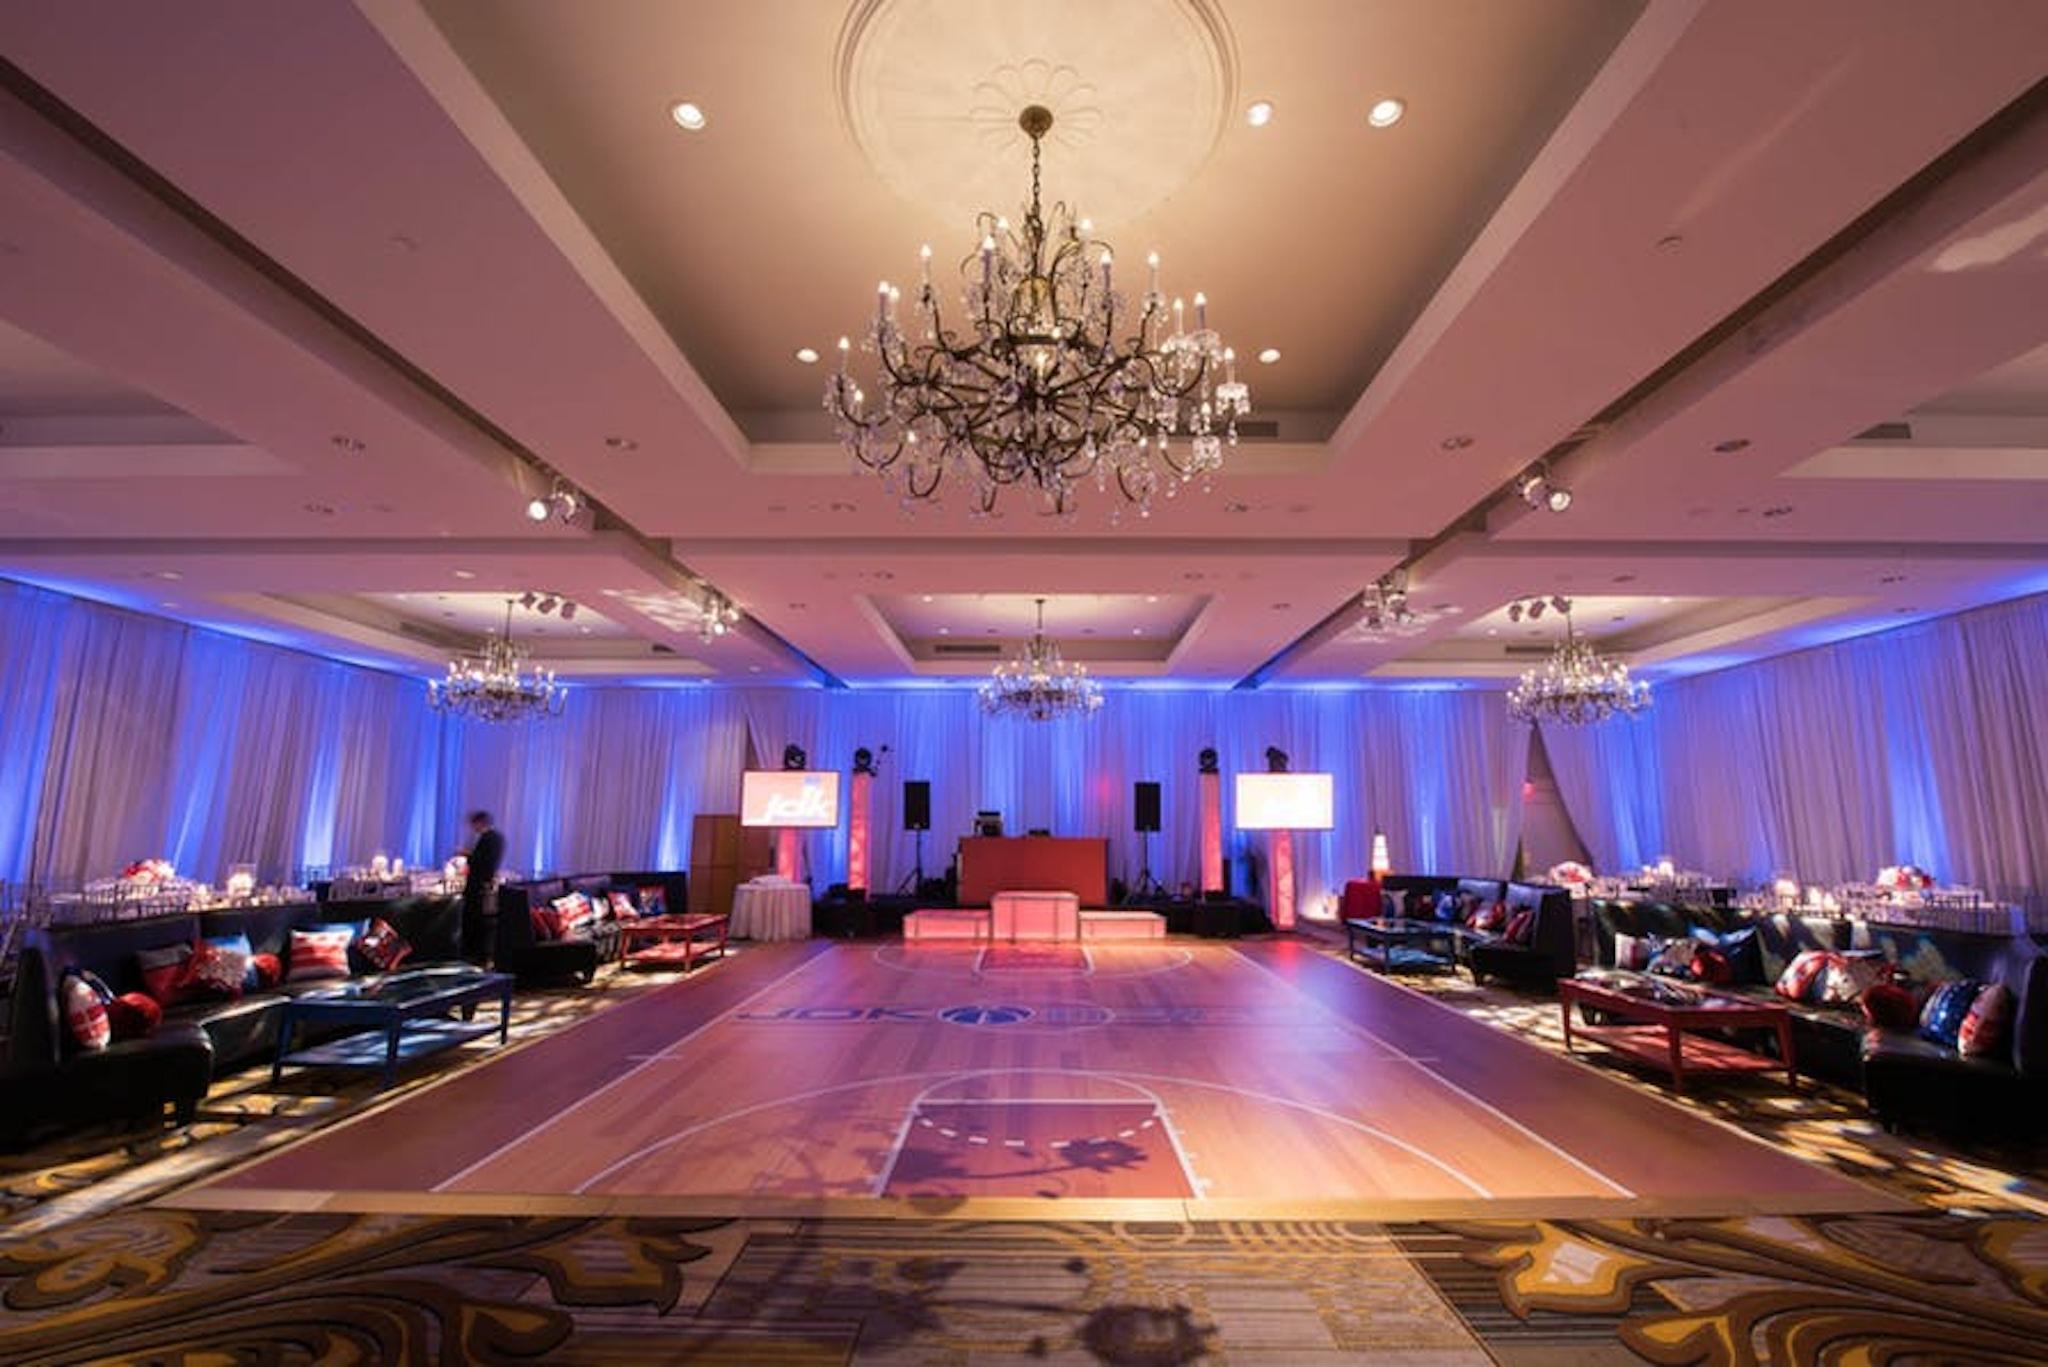 four seasons hotel ballroom dance floor with purple lighting and drapery